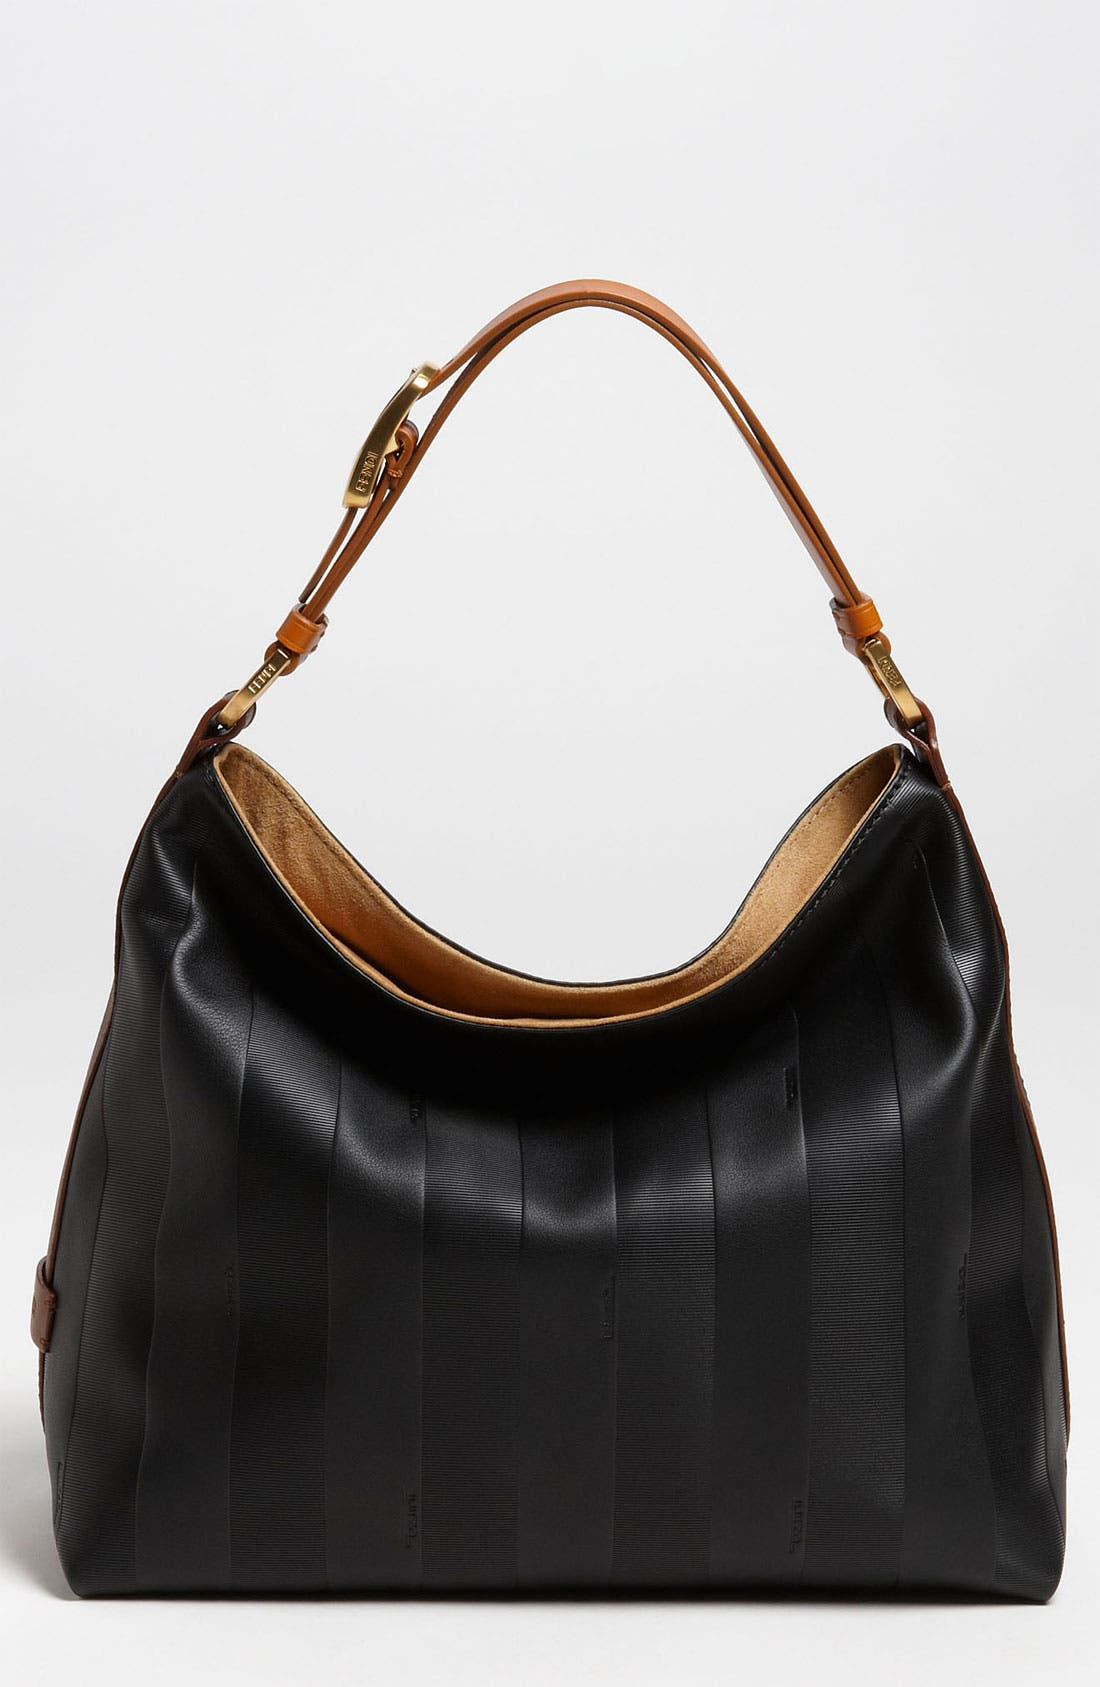 Alternate Image 1 Selected - Fendi 'Paris Pequin - Small' Leather Hobo